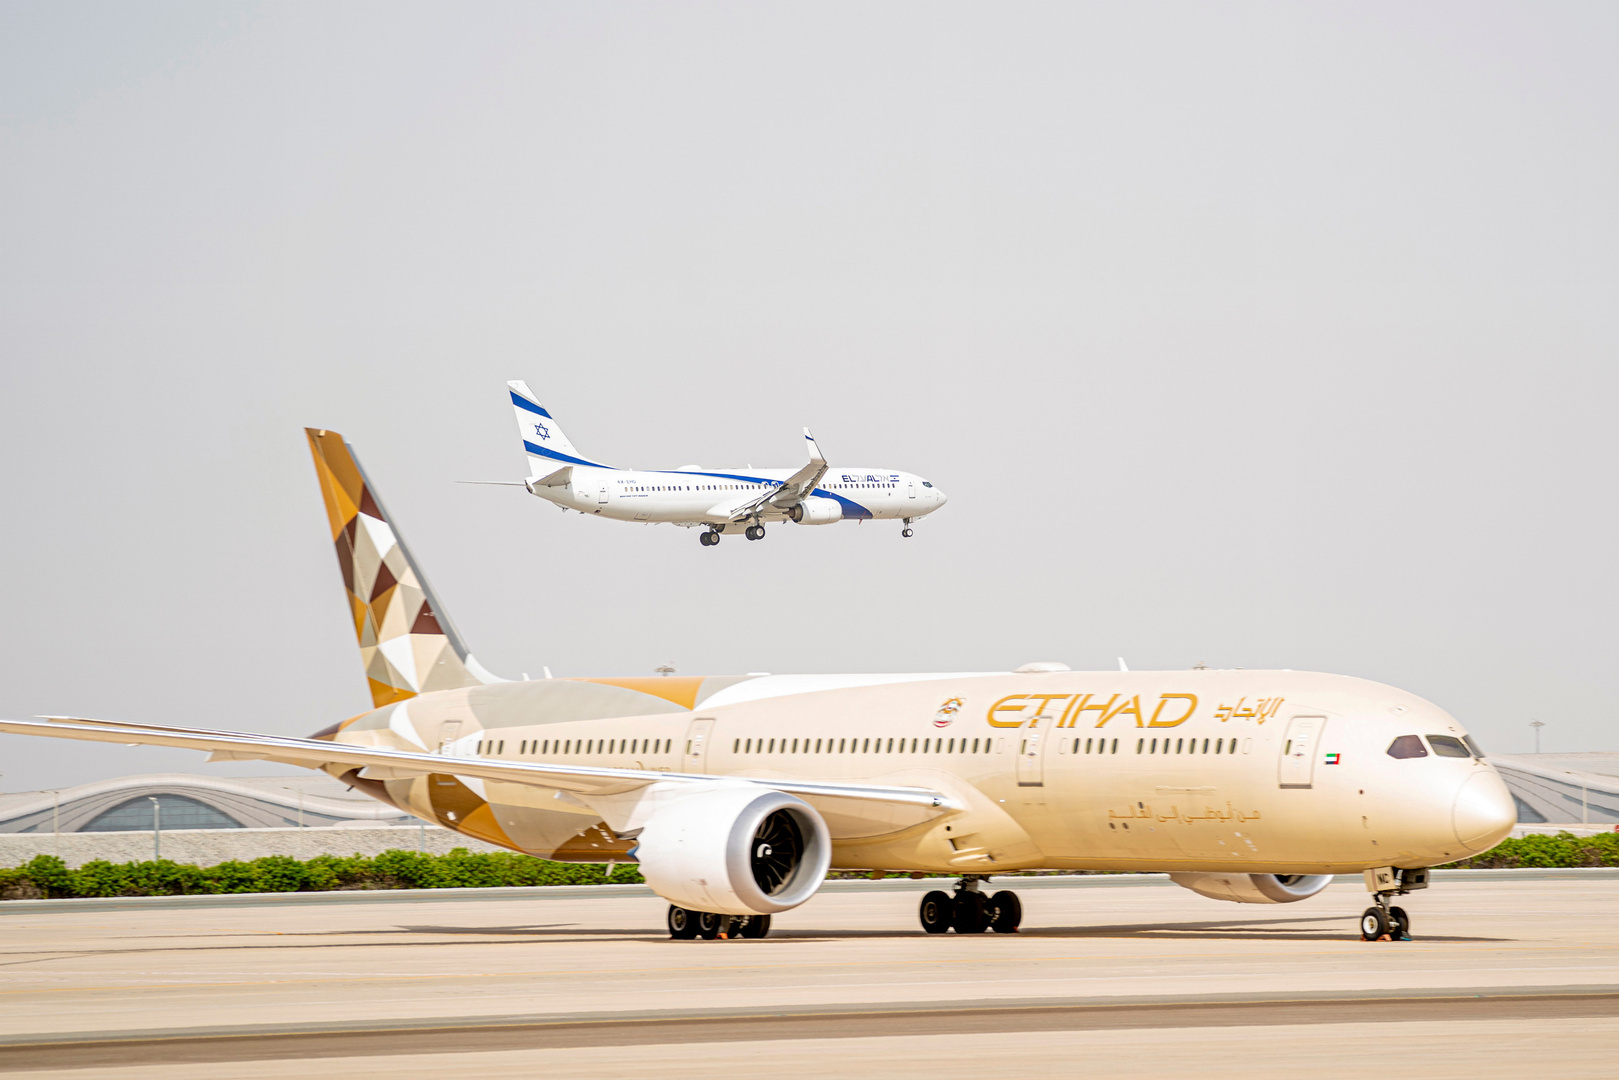 إسرائيل تغلق مطار